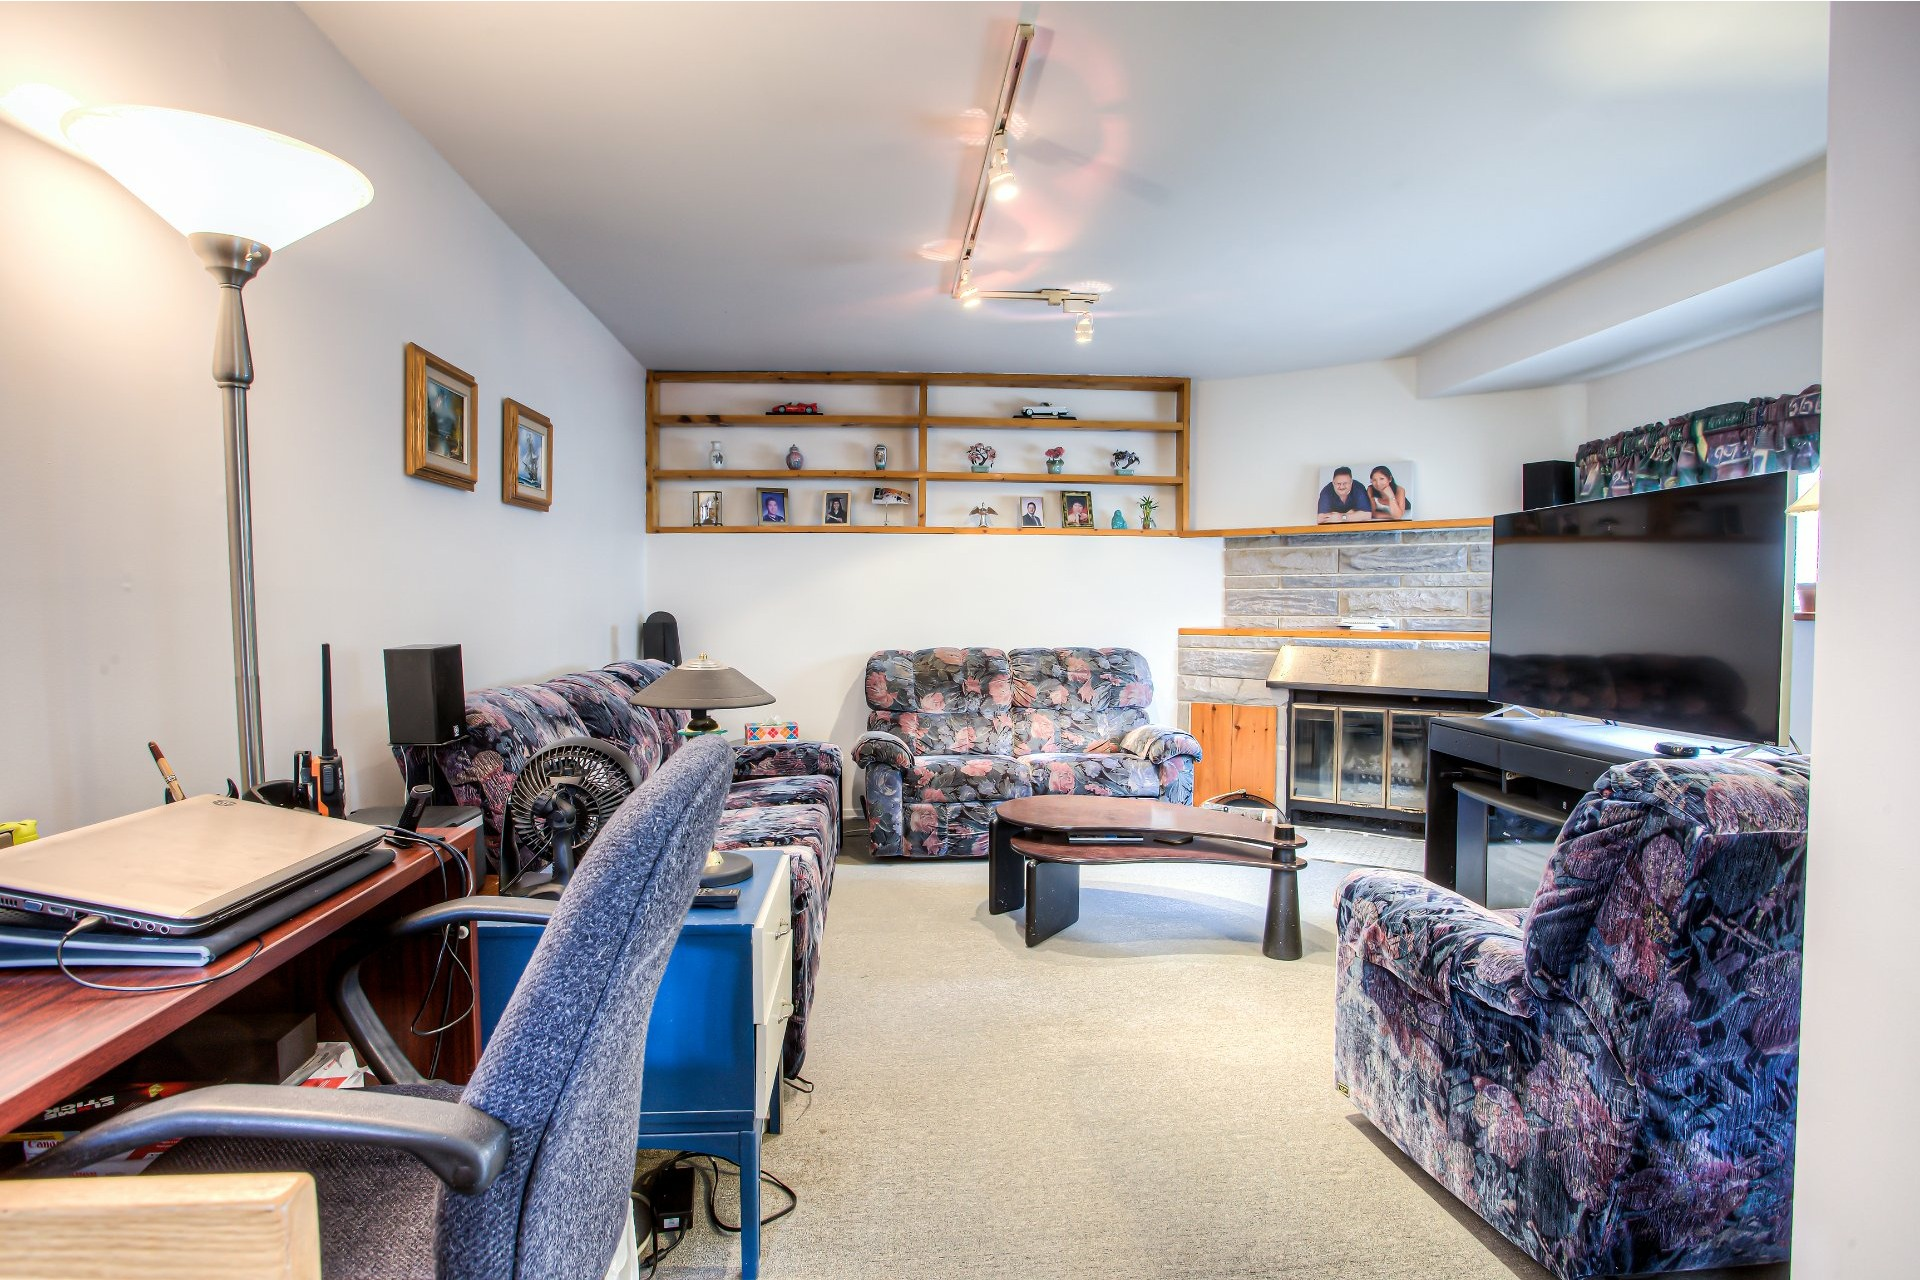 image 15 - MX - Casa sola - MX En venta Dollard-Des Ormeaux - 11 habitaciones